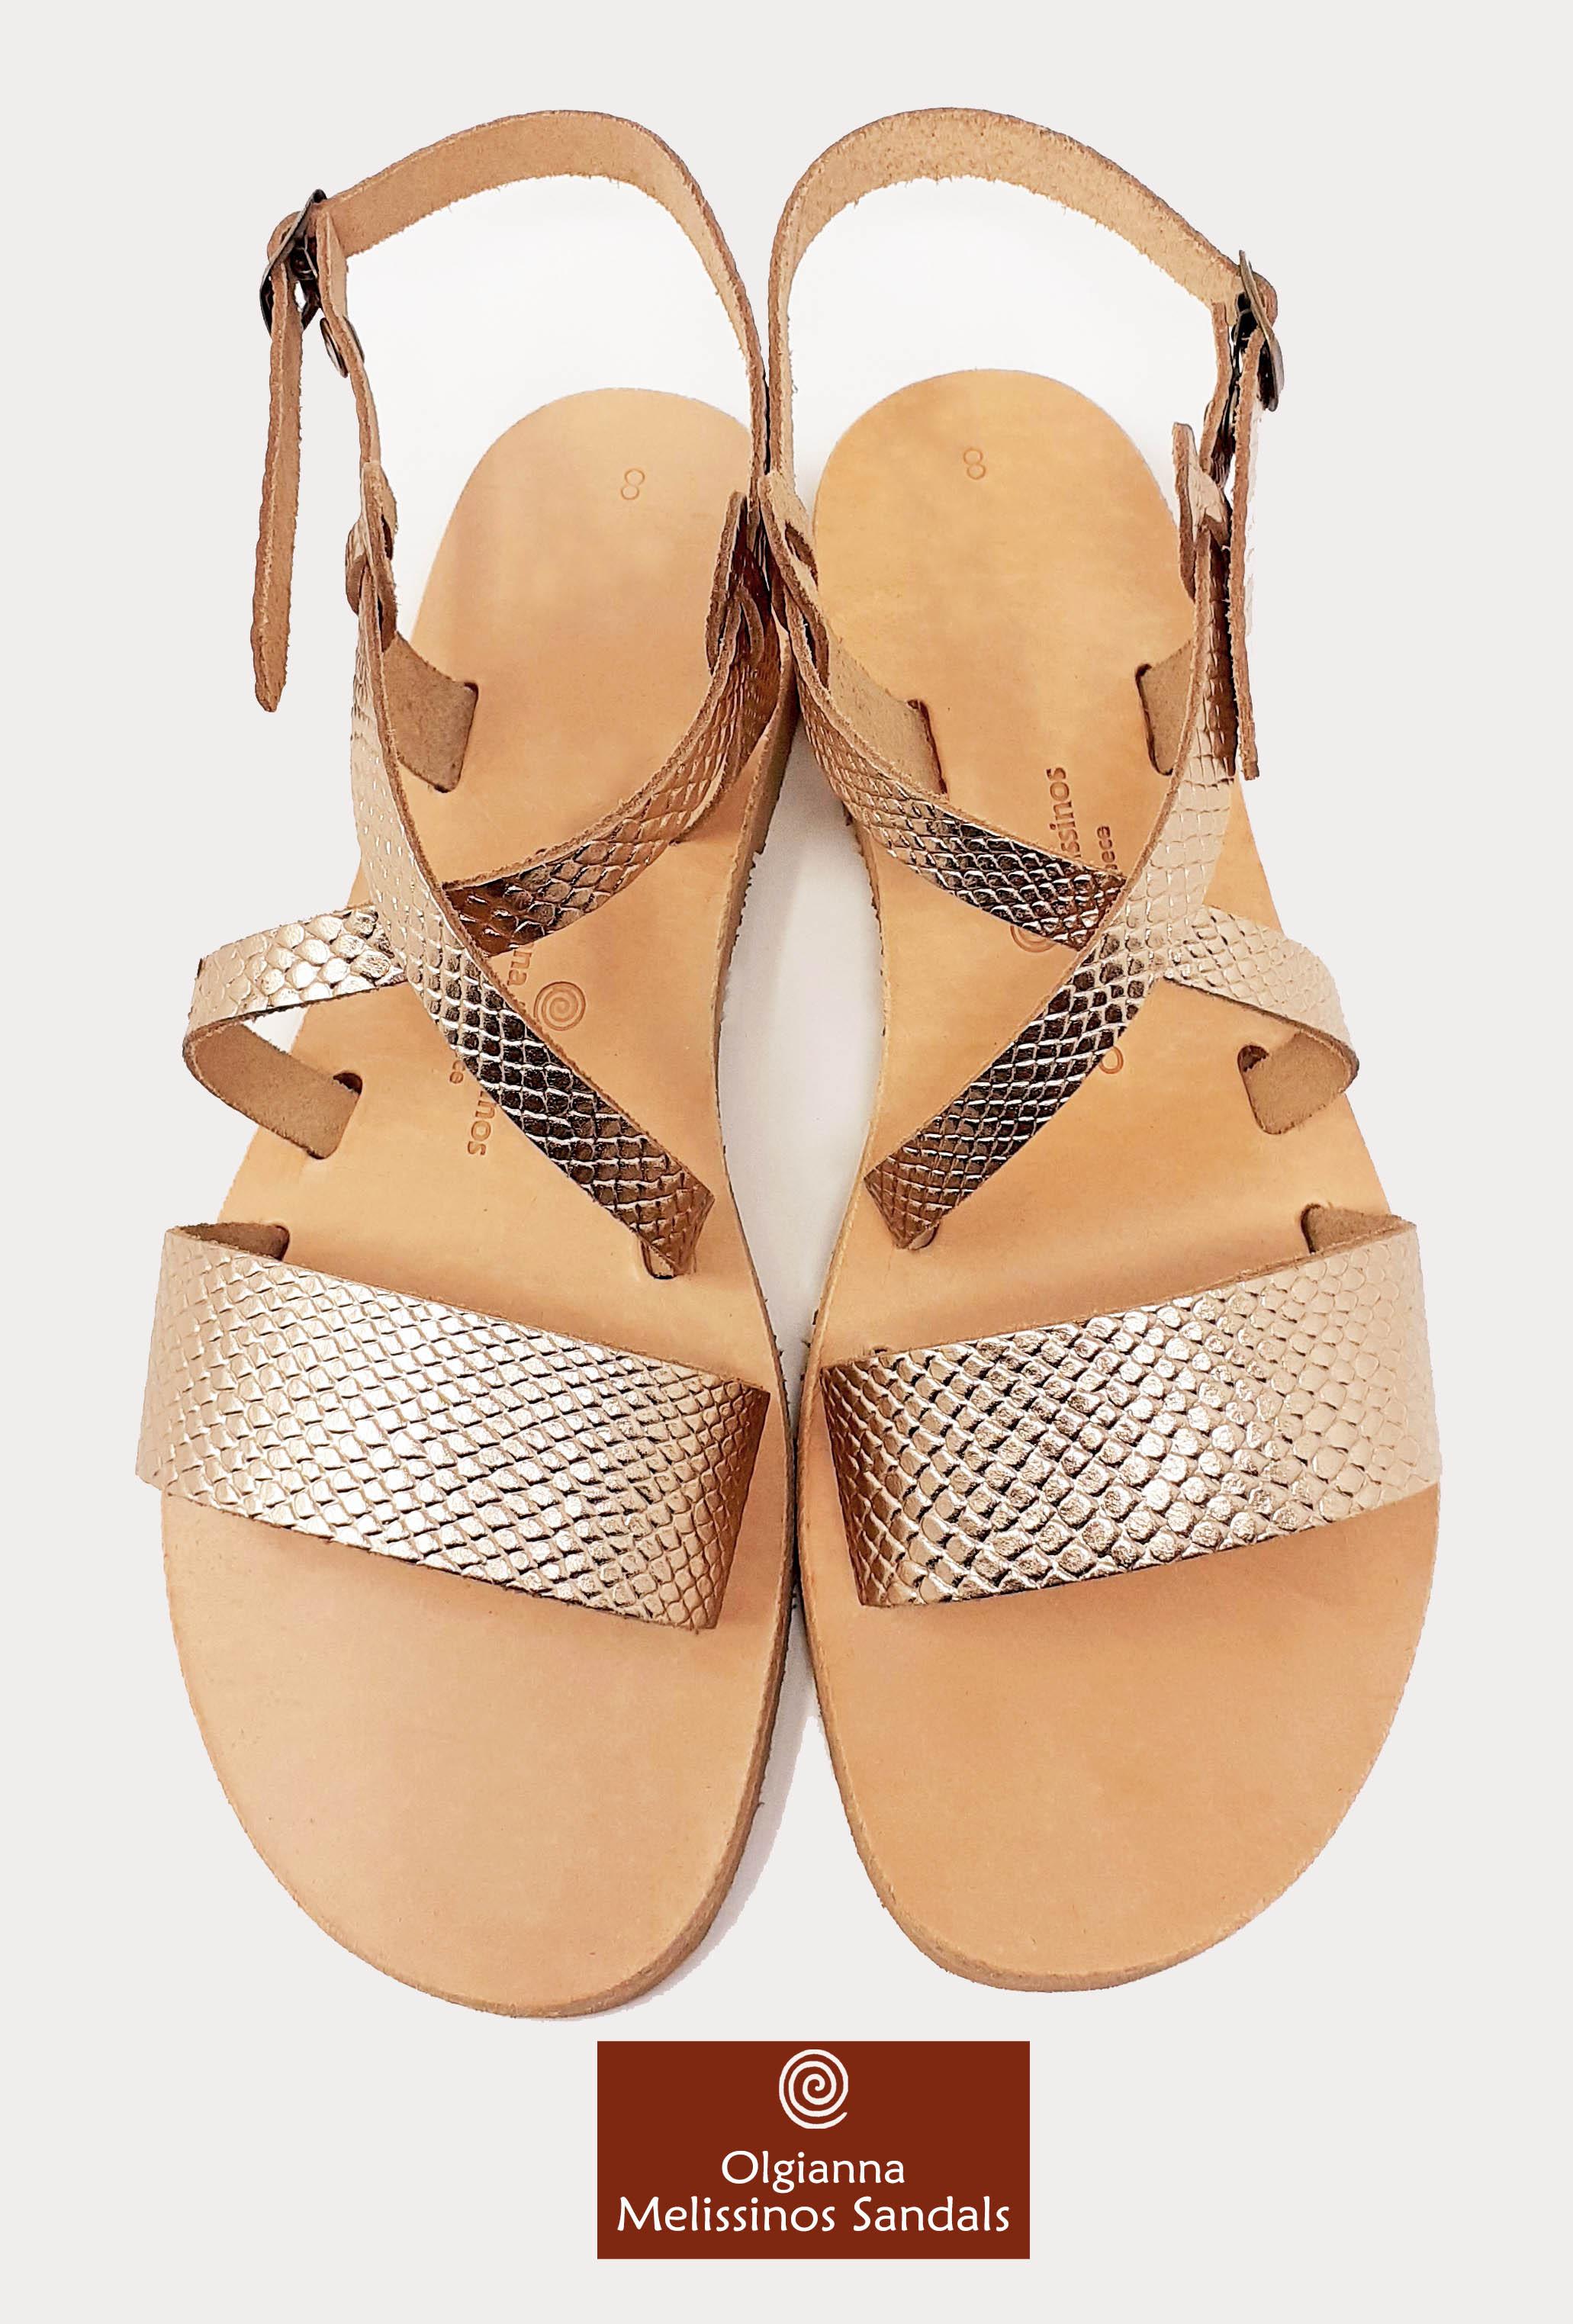 Handmade Sandals - JASON SNAKE GRECIAN GOLD 08FGGK